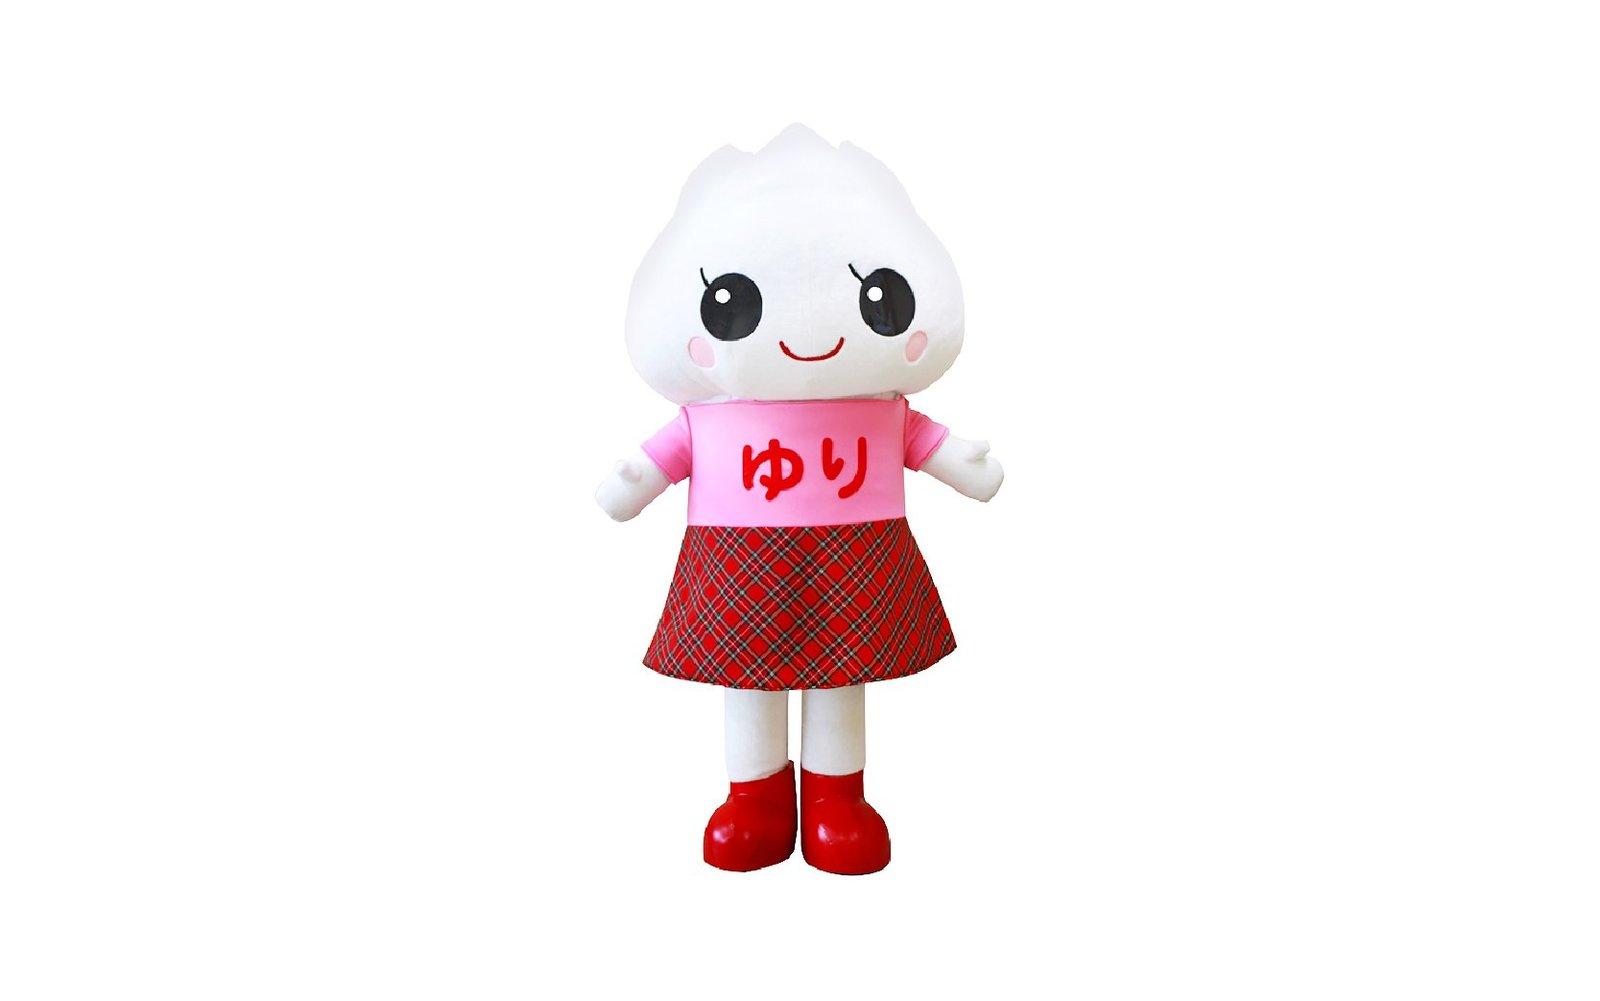 yurineh san is the lily bulb mascot of makkari town hokkaido japan